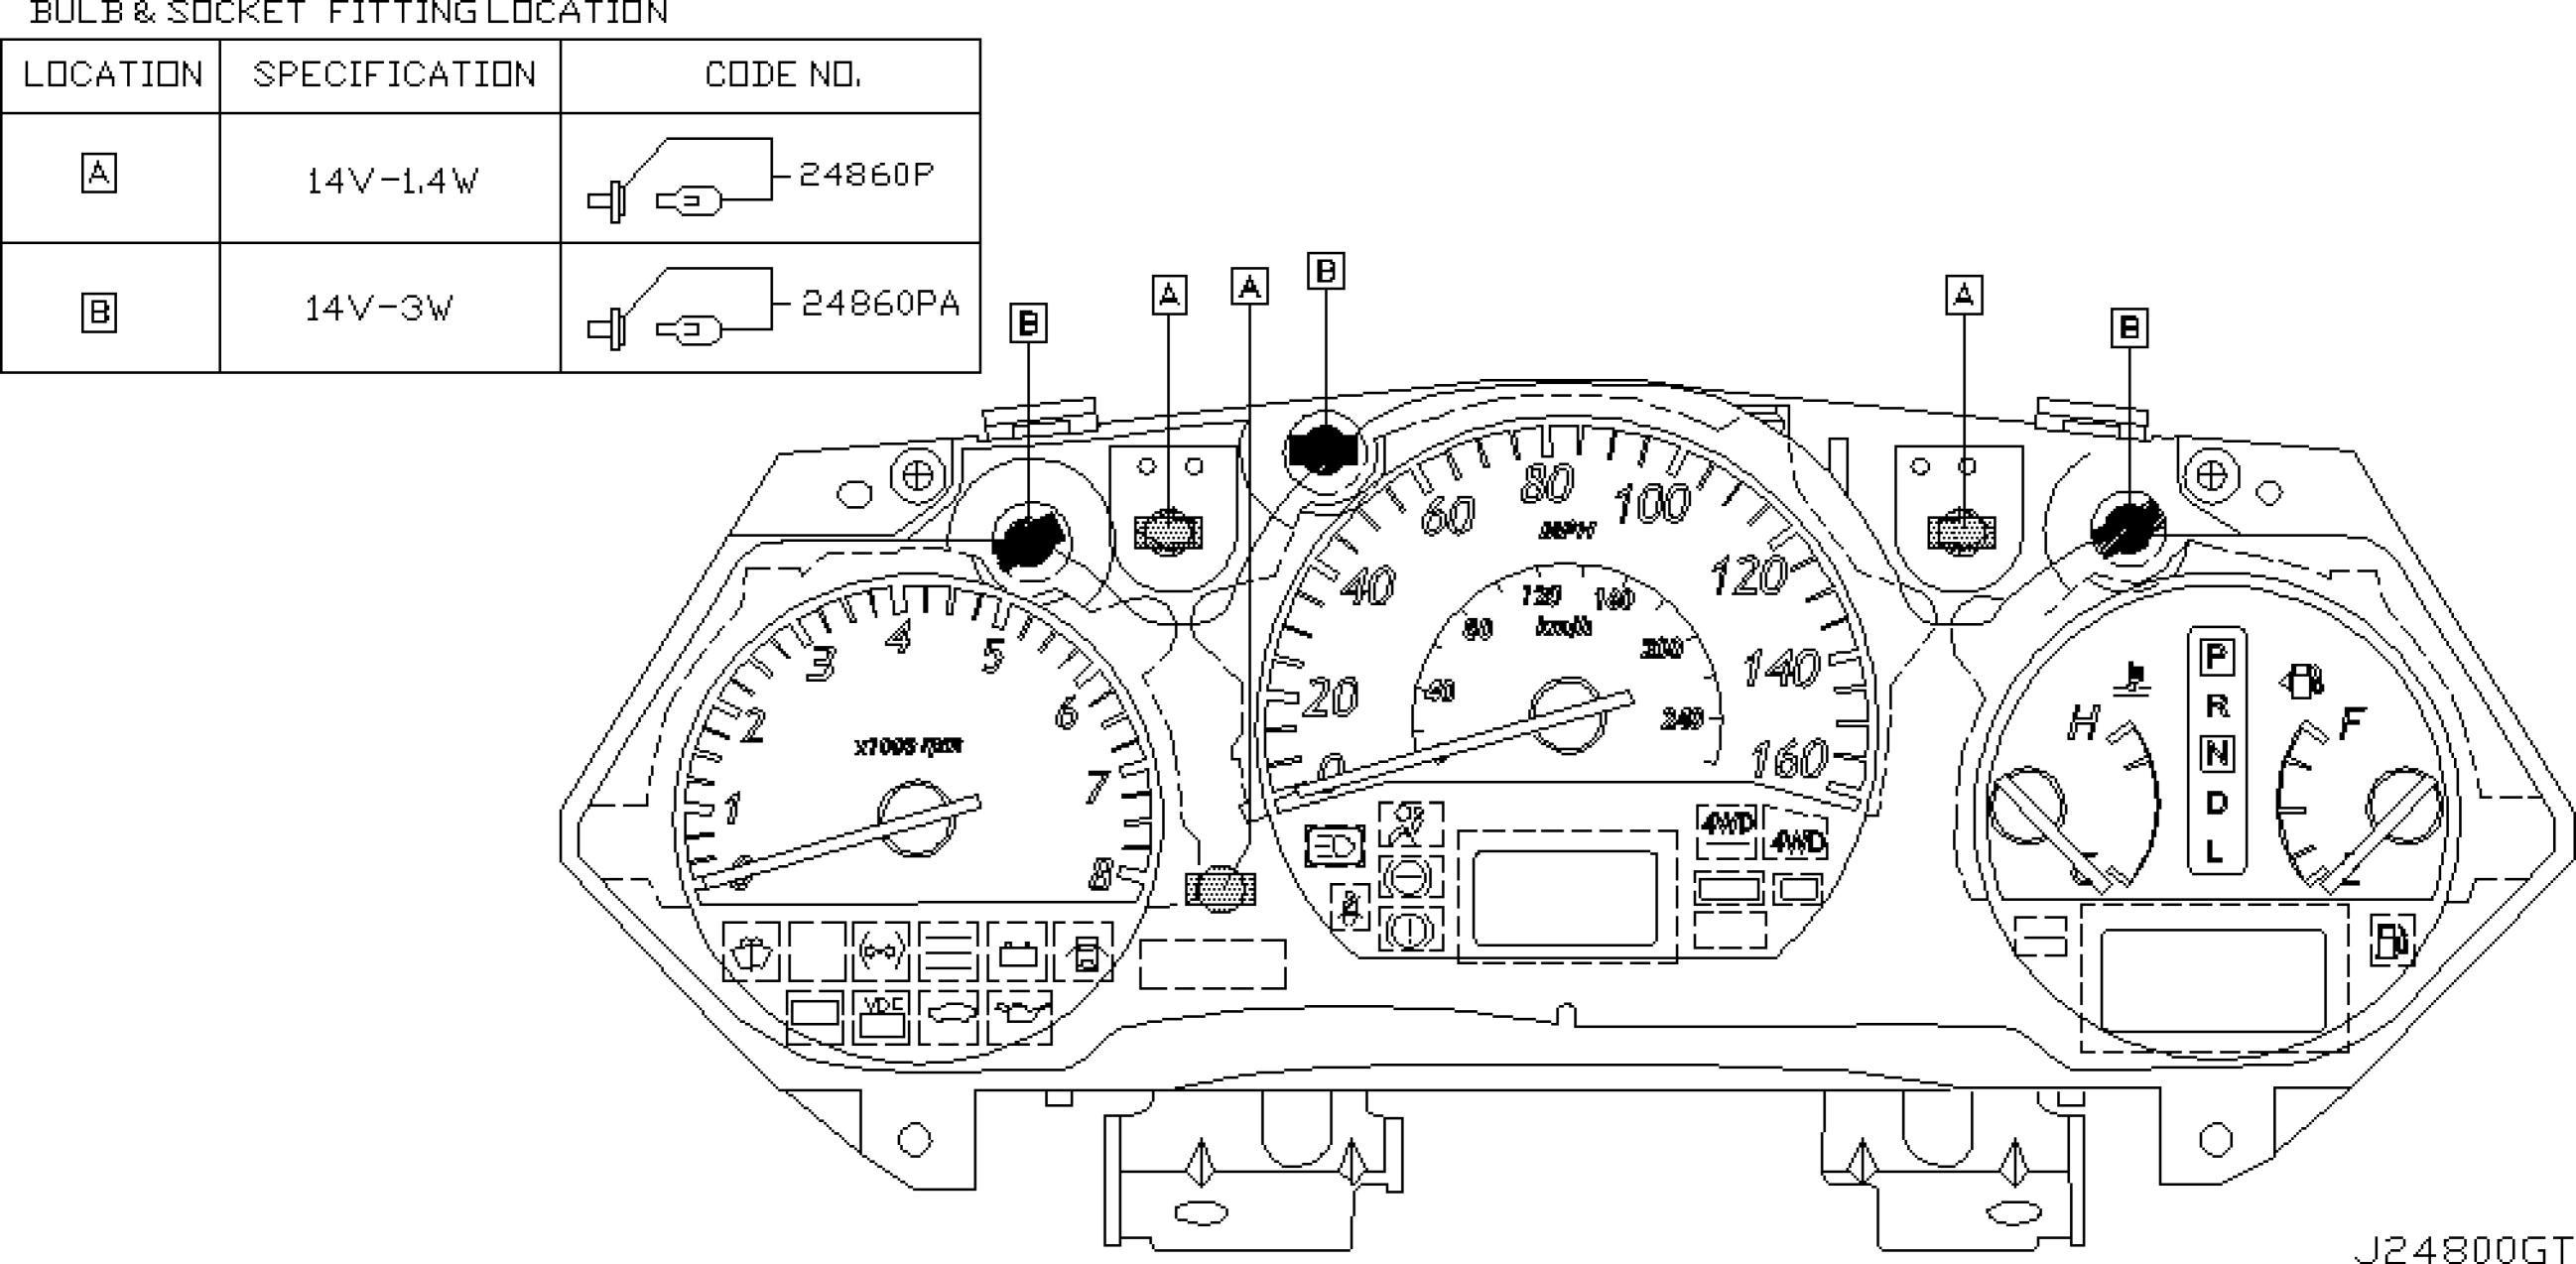 1999 Nissan Altima Engine Diagram 2007 Nissan Altima Bination Lamp Xenontype Parts Diagram Car Of 1999 Nissan Altima Engine Diagram